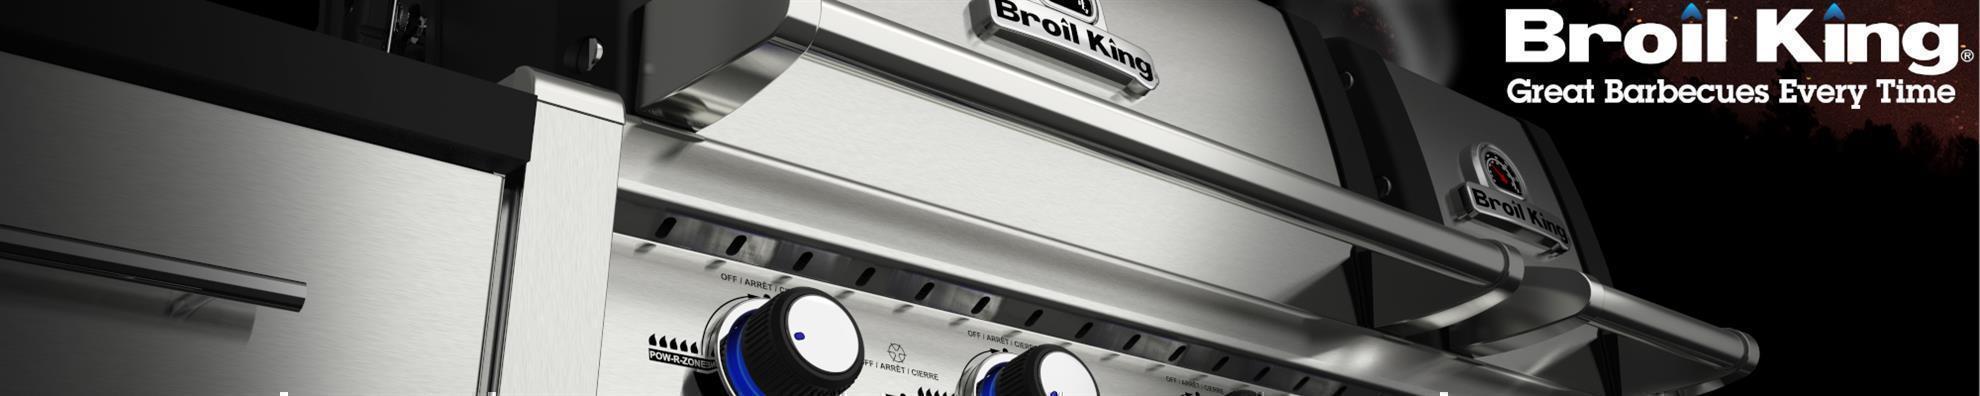 Broil King - SCHUTZHÜLLE REGAL PELLET 400